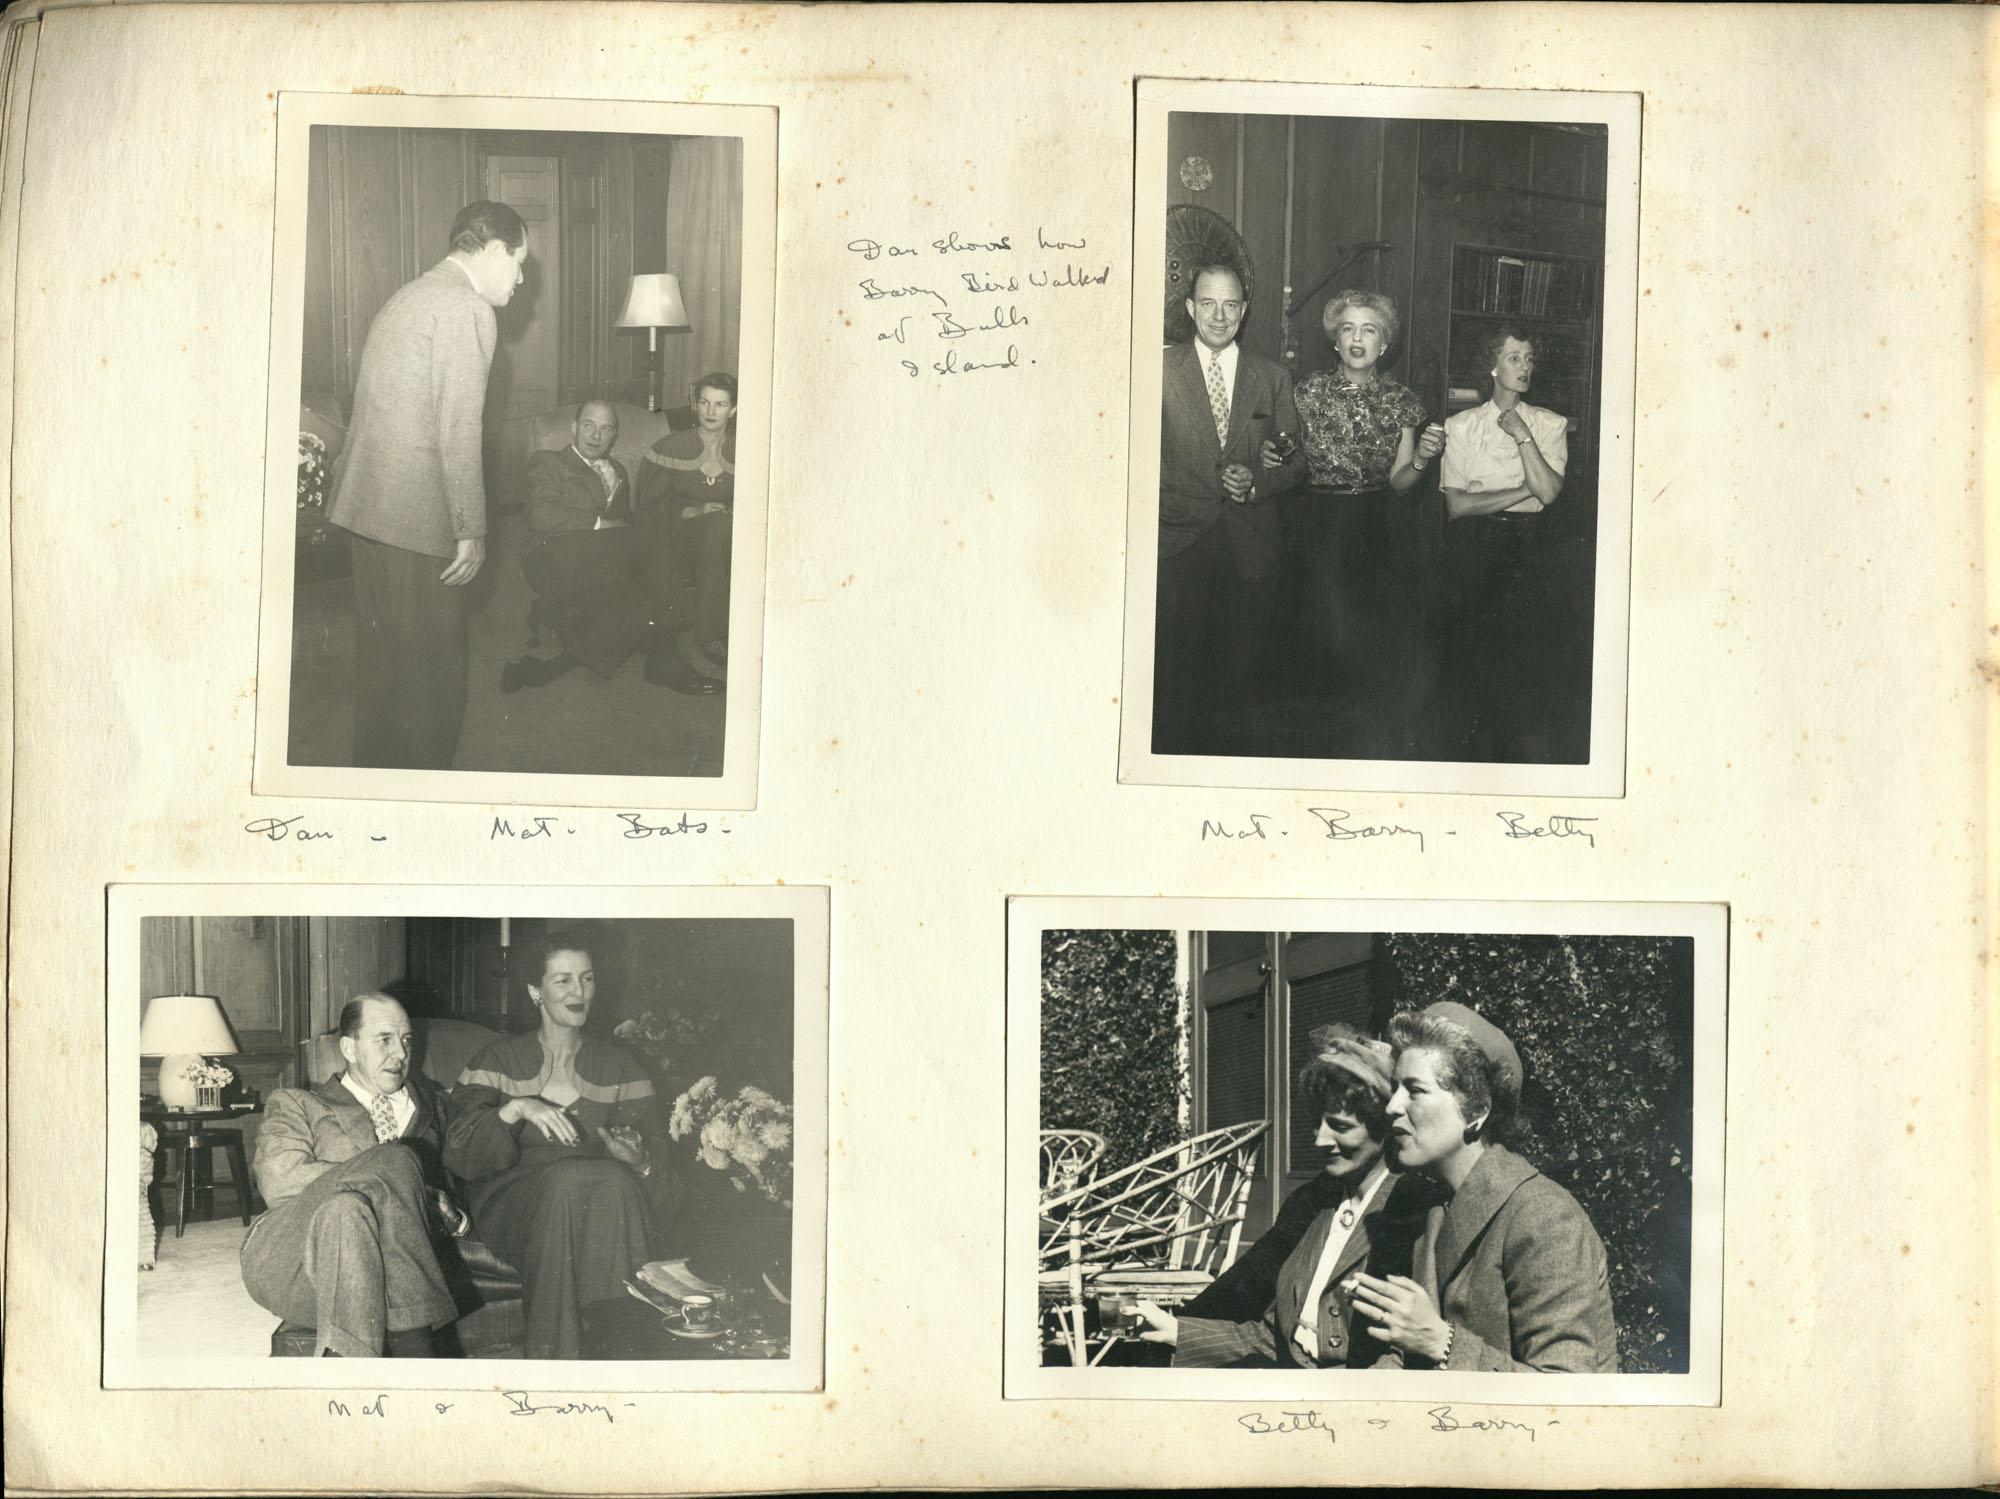 Medway Plantation Photograph Album, 1949, page 112